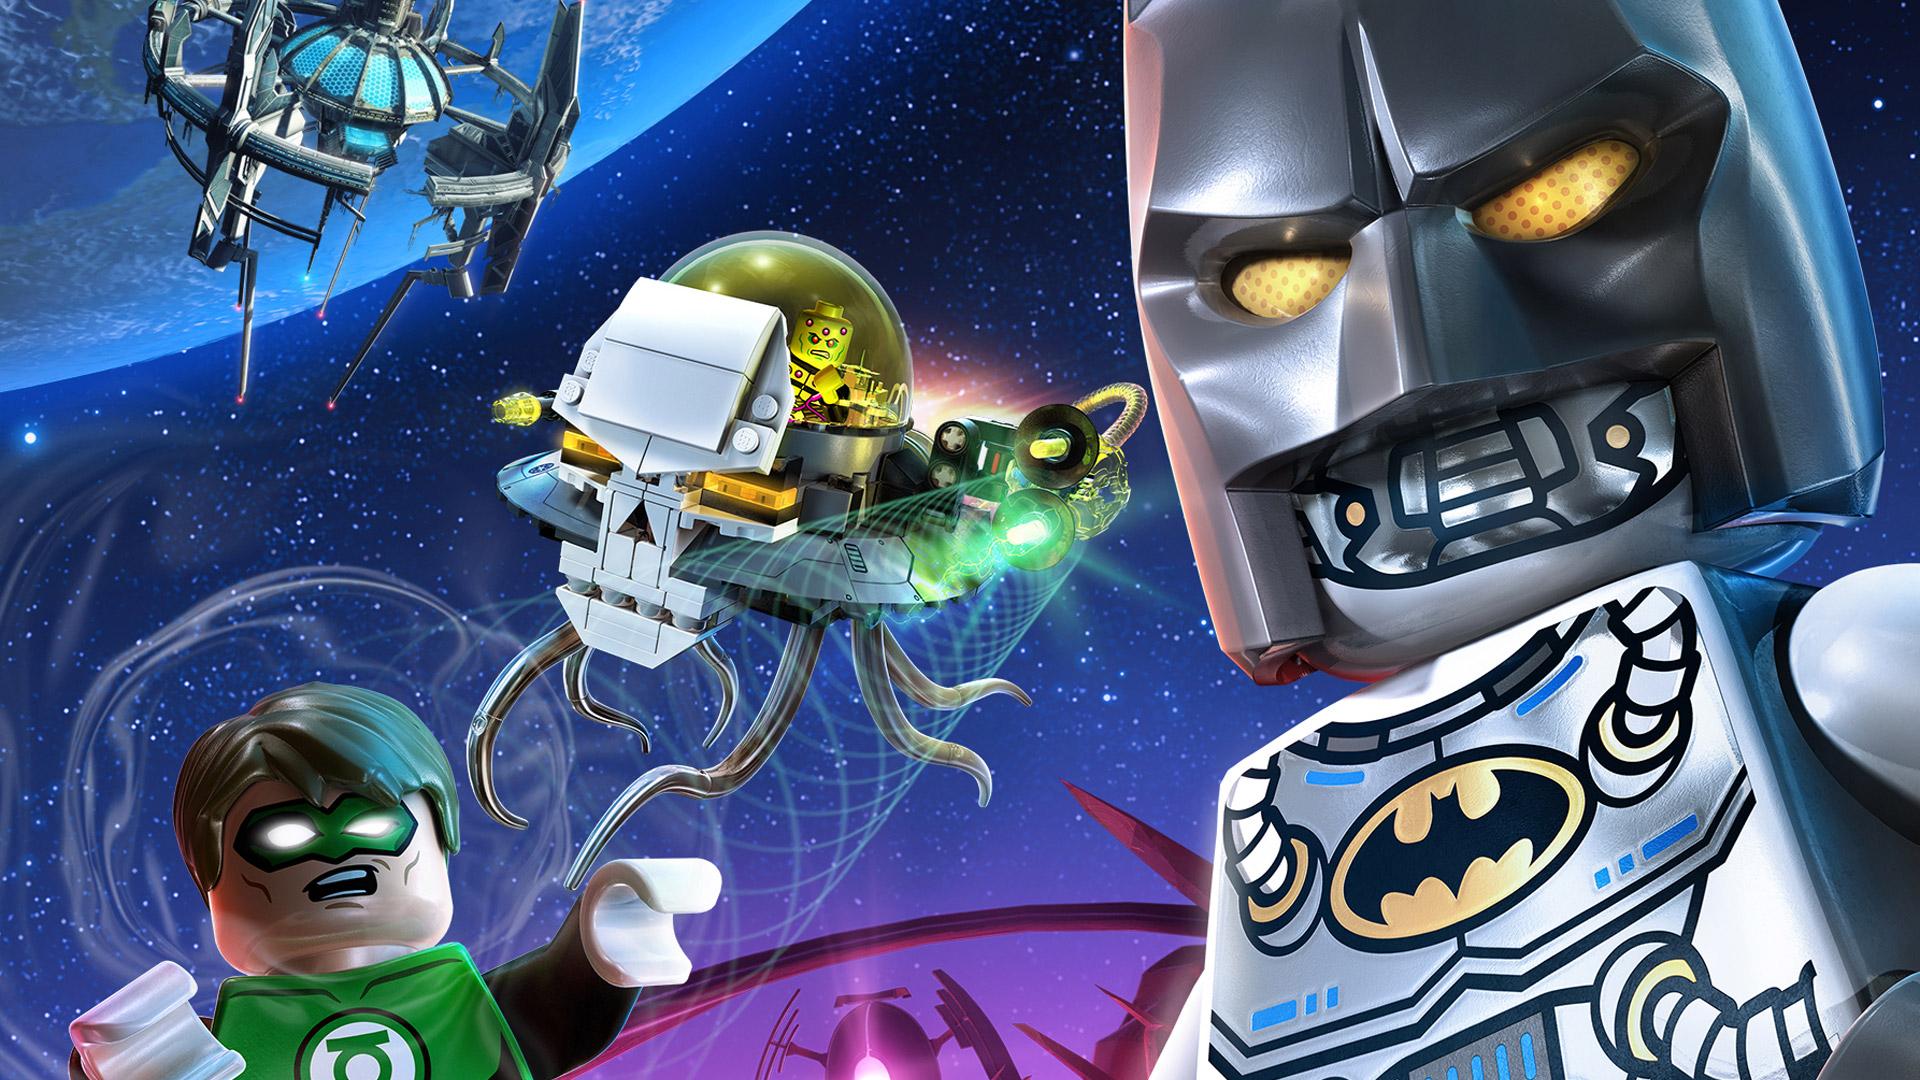 Lego Batman 3: Beyond Gotham Wallpaper in 1920x1080